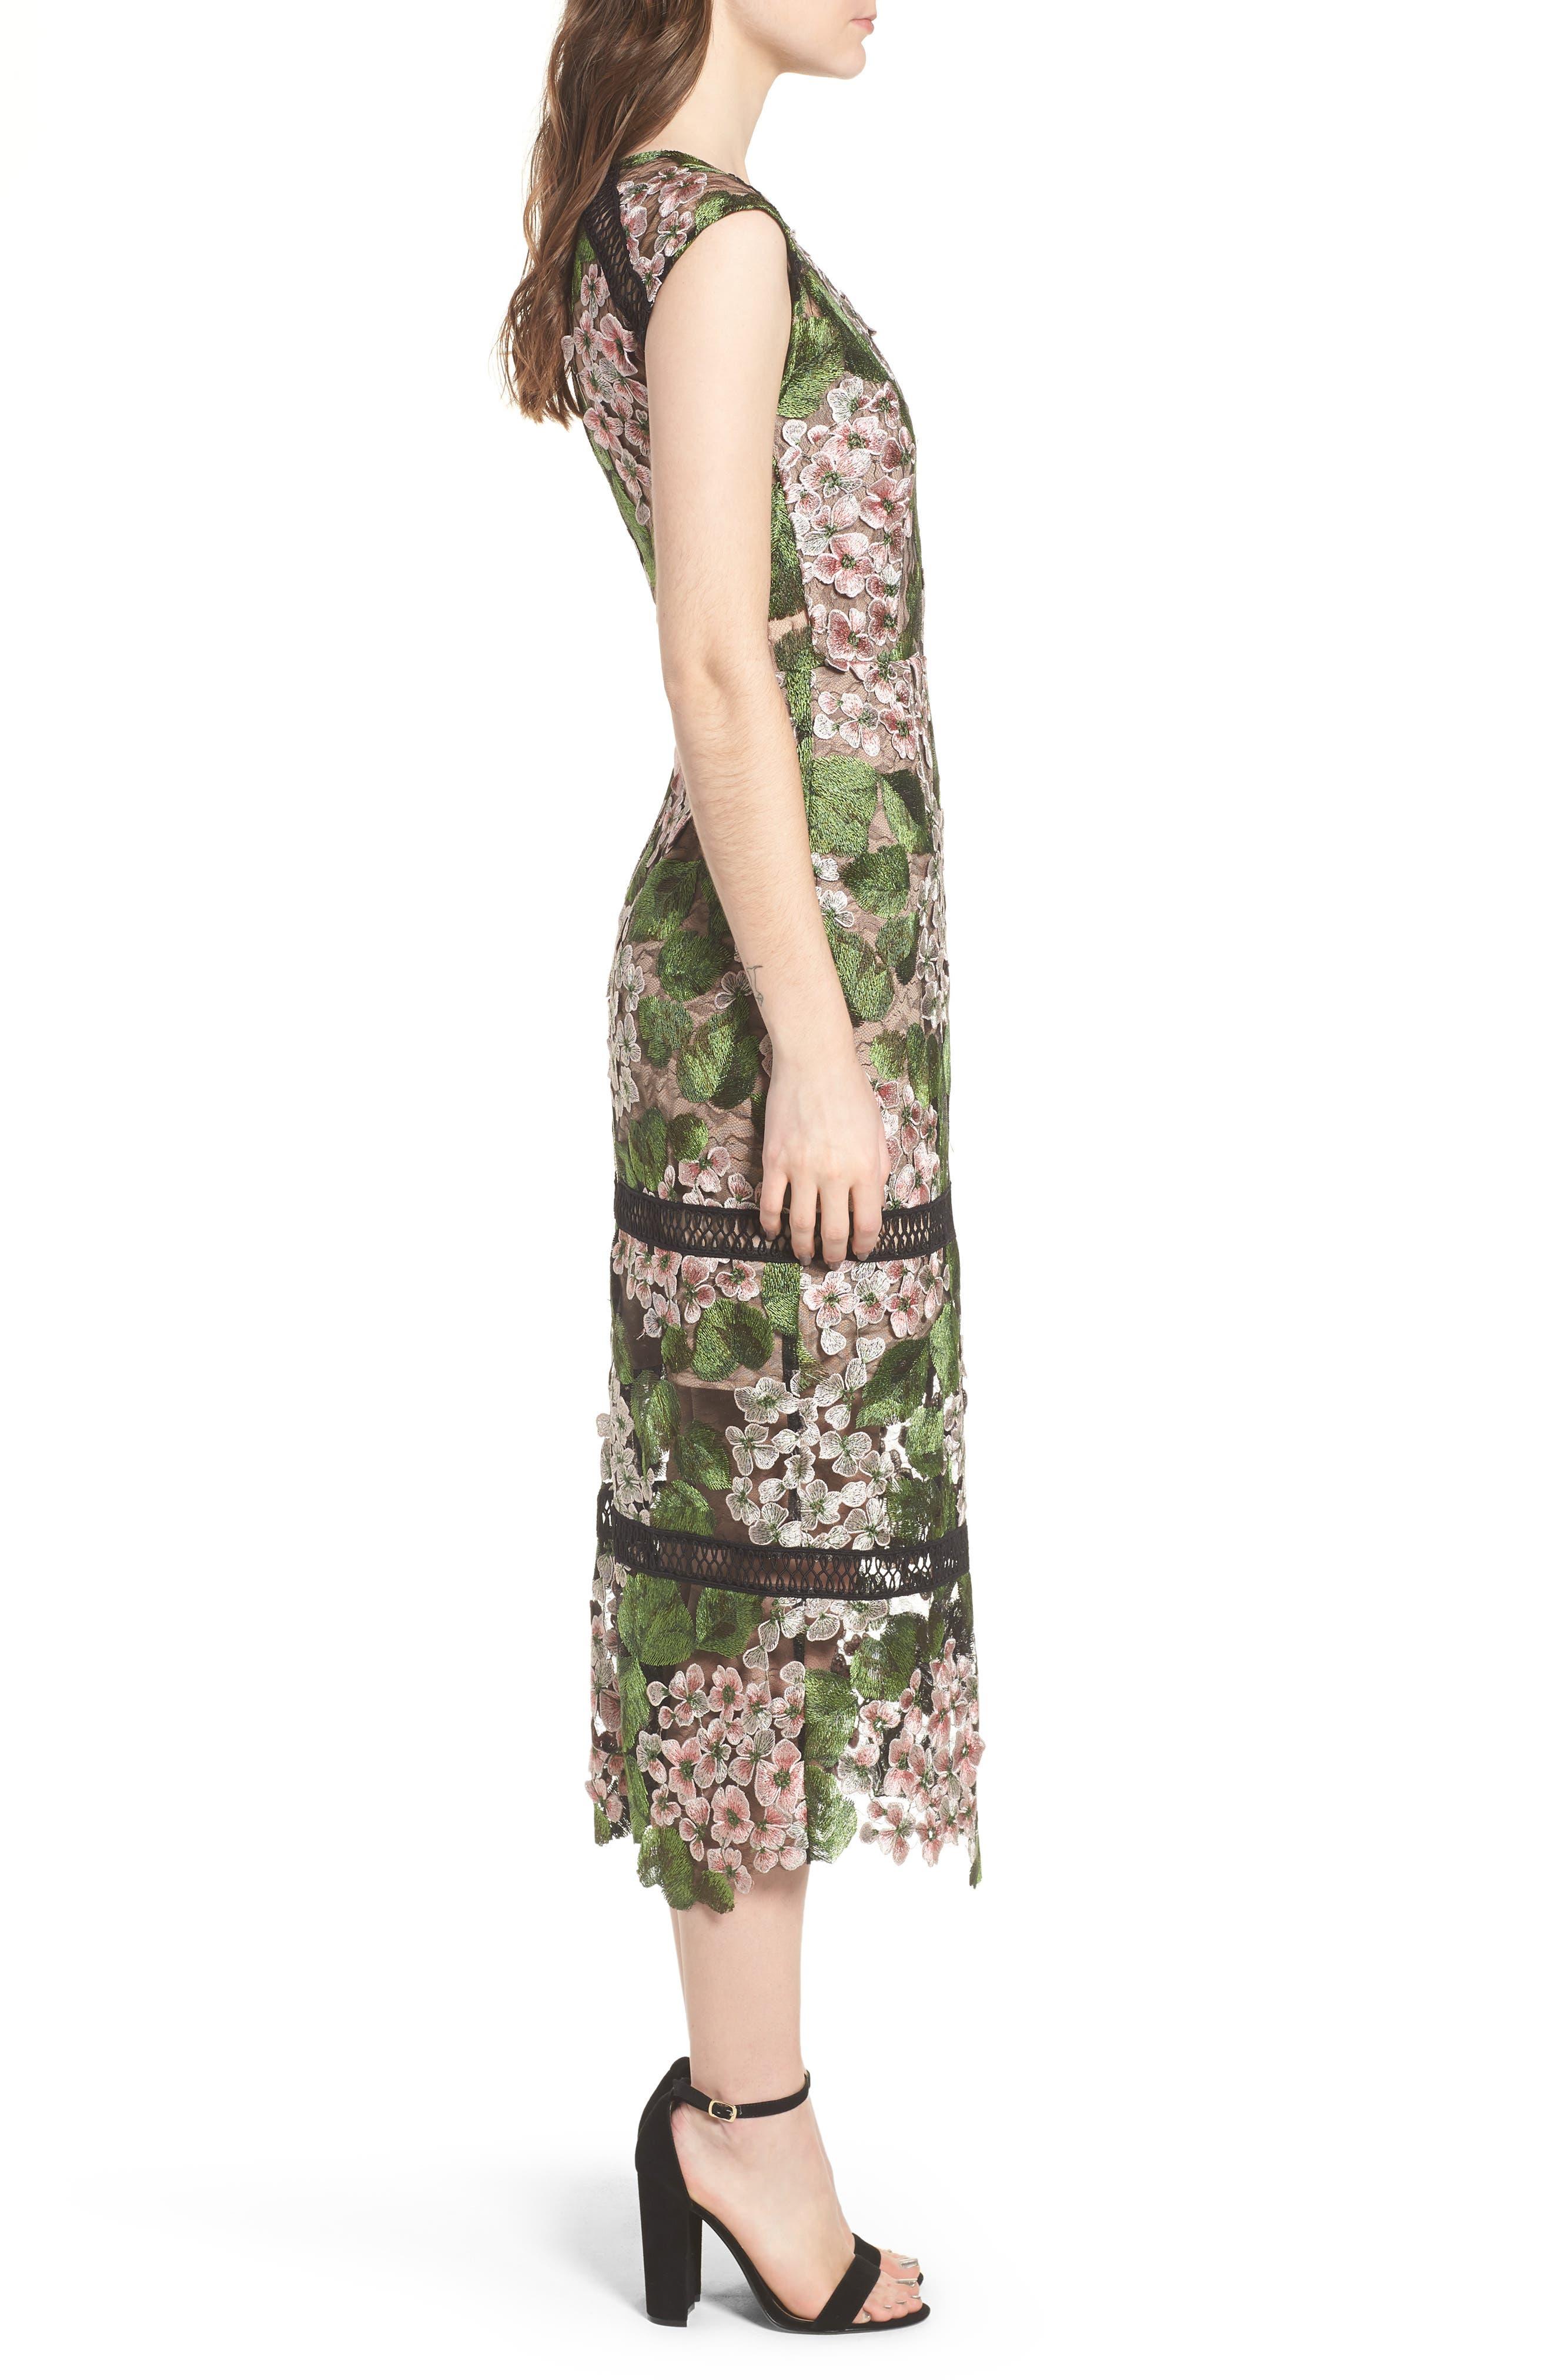 Cherry Hydrangea Lace Dress,                             Alternate thumbnail 3, color,                             Multicolor Pink